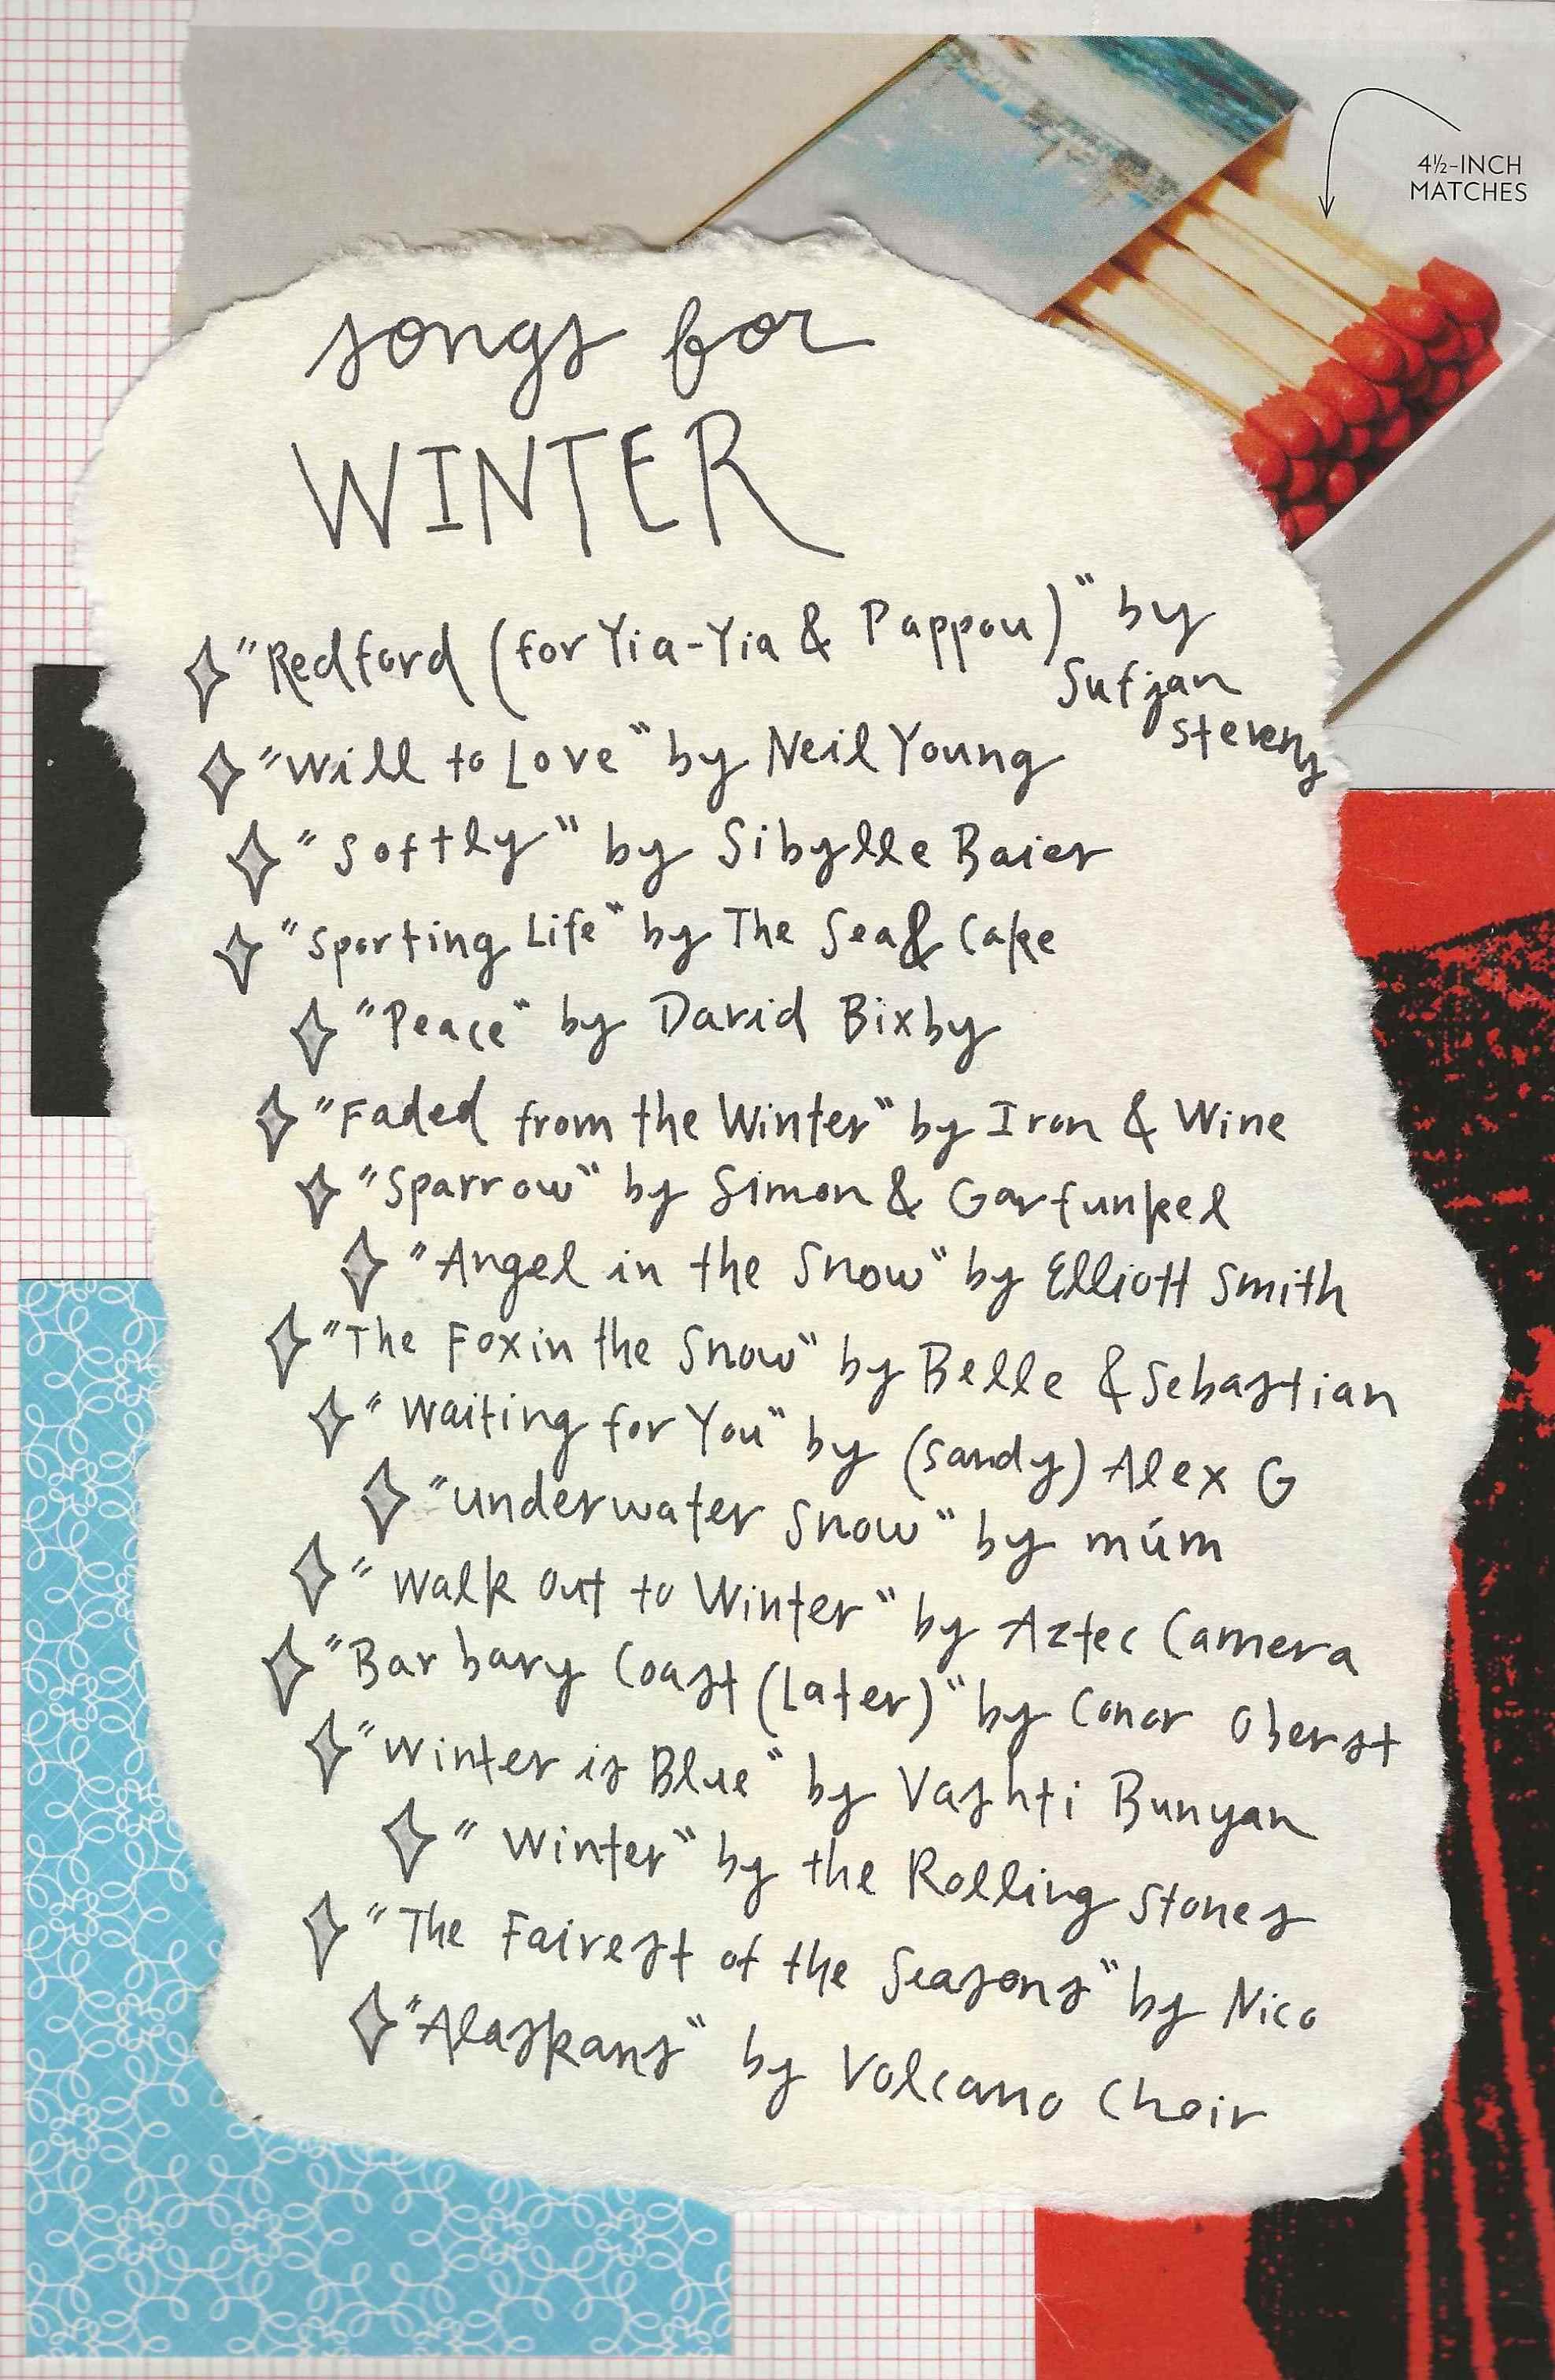 Songs for Winter playlist.jpg